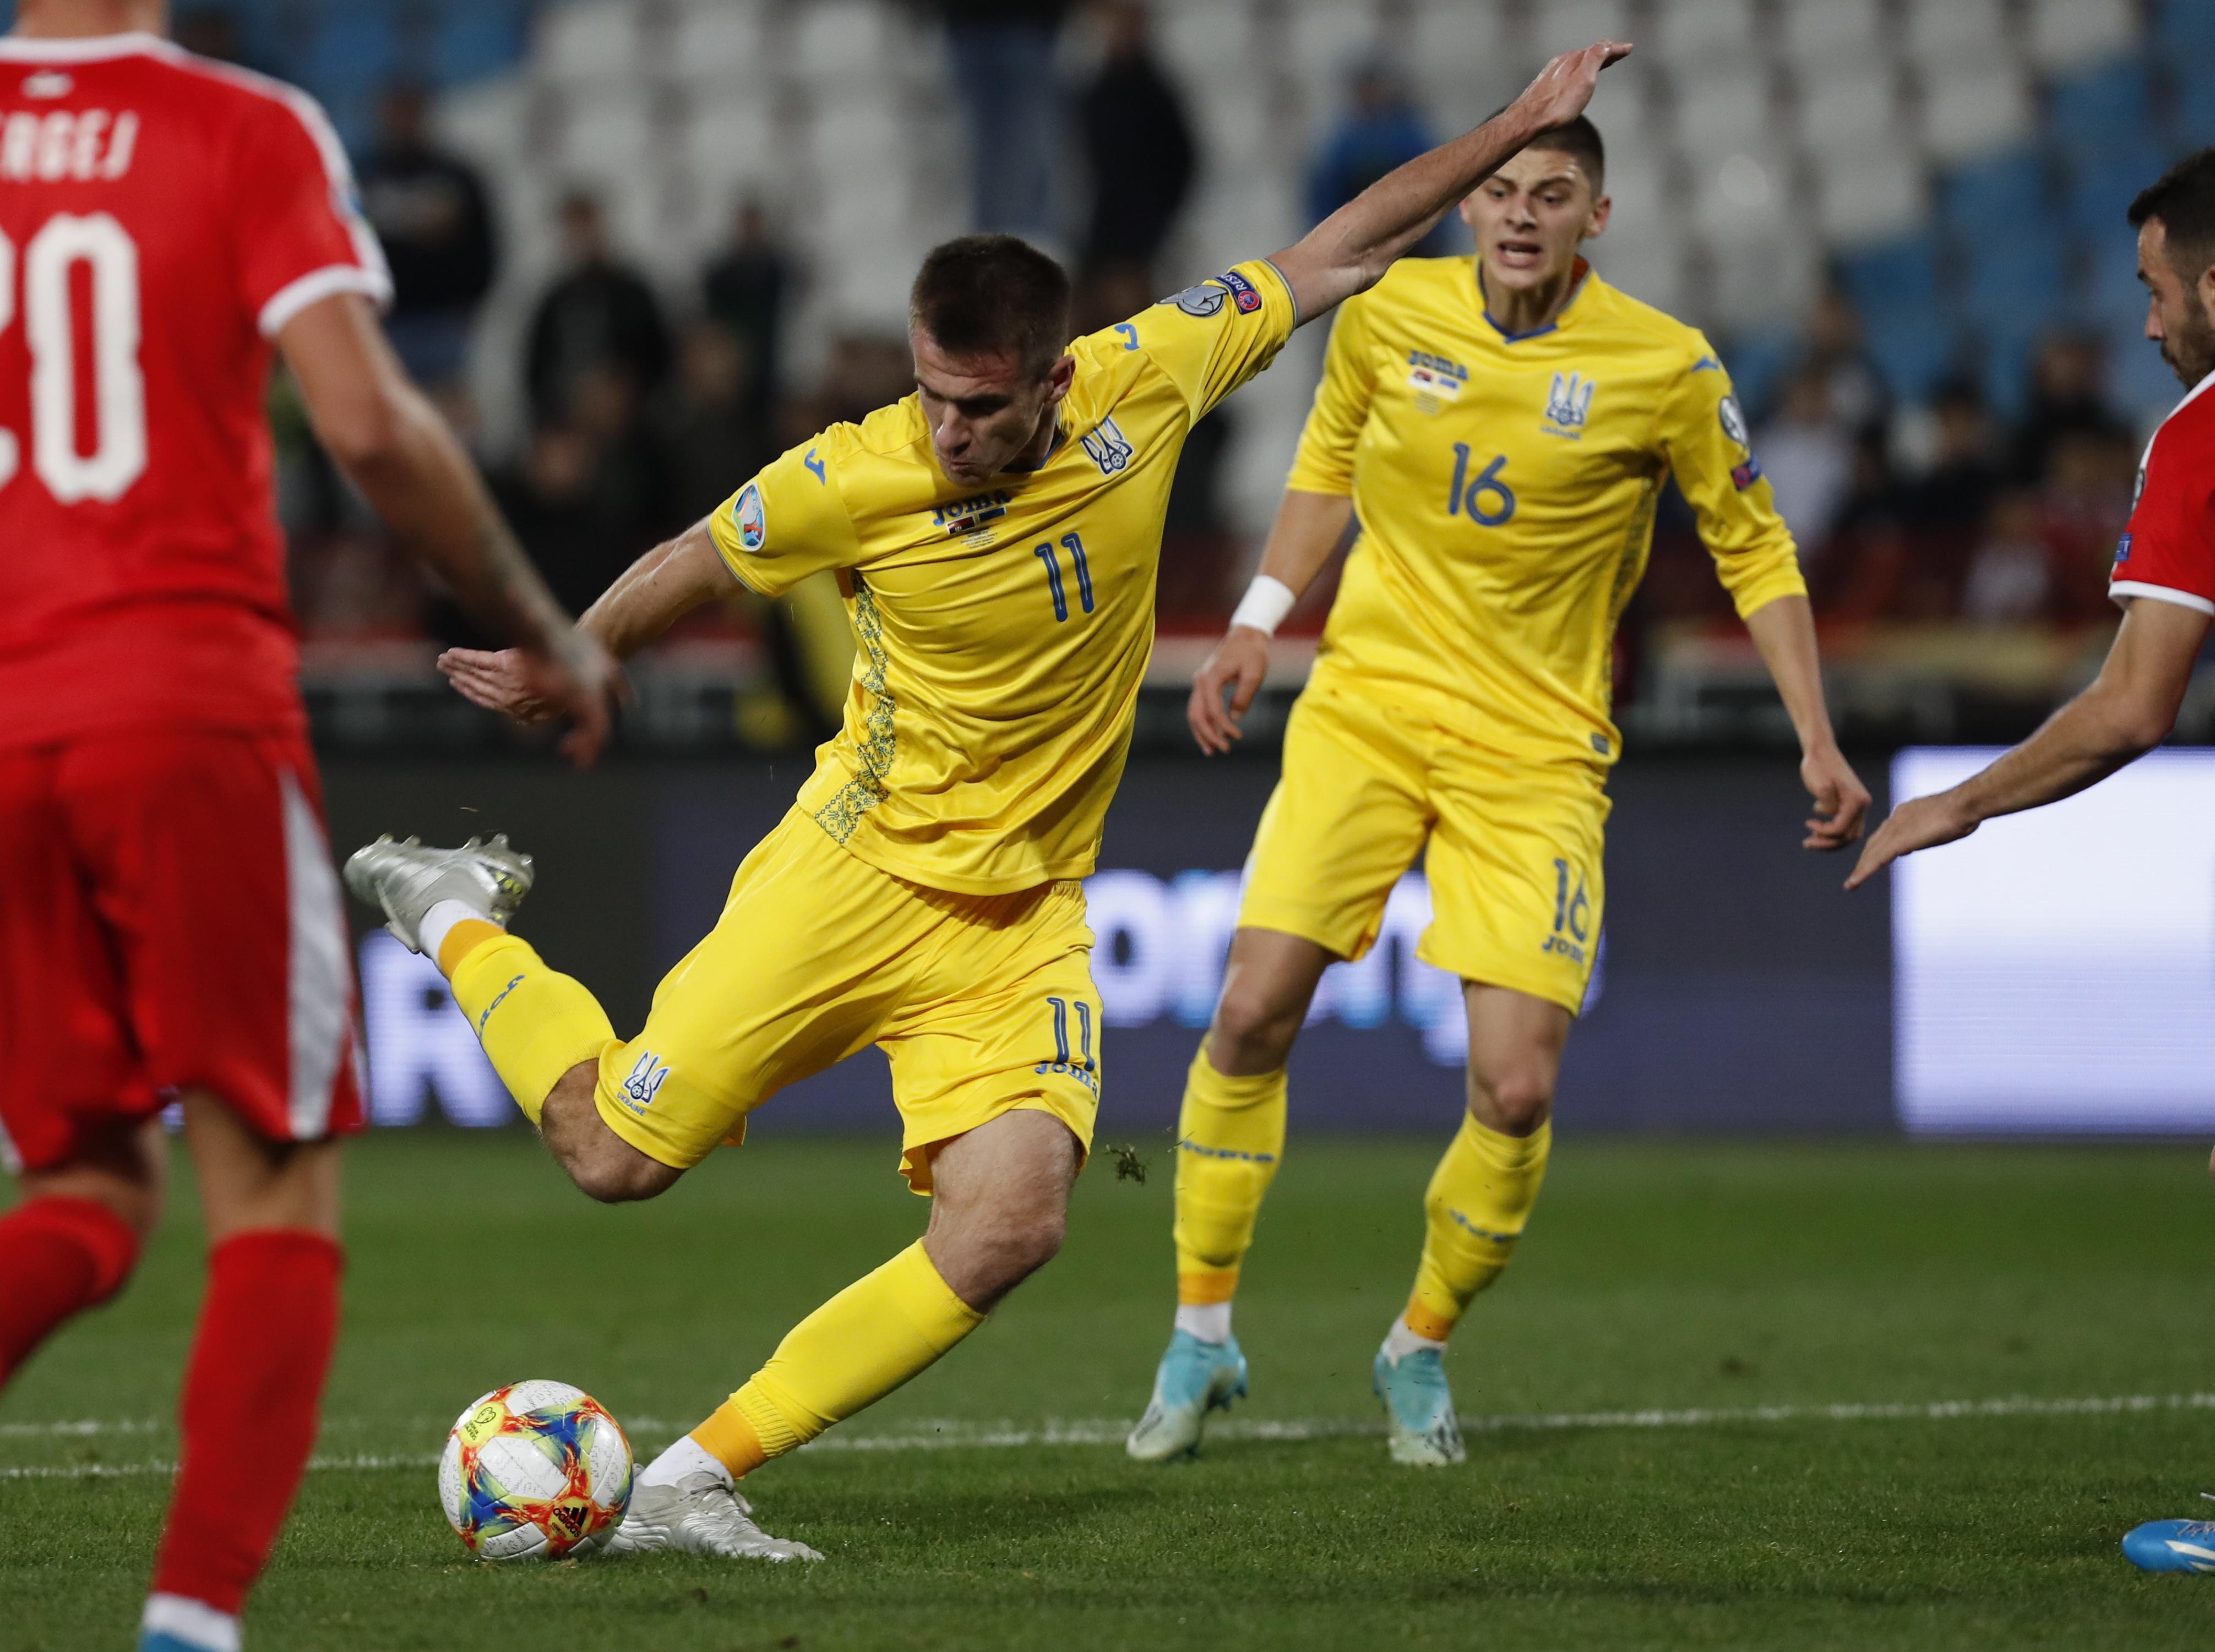 Dynamo Kyiv striker faces doping charge